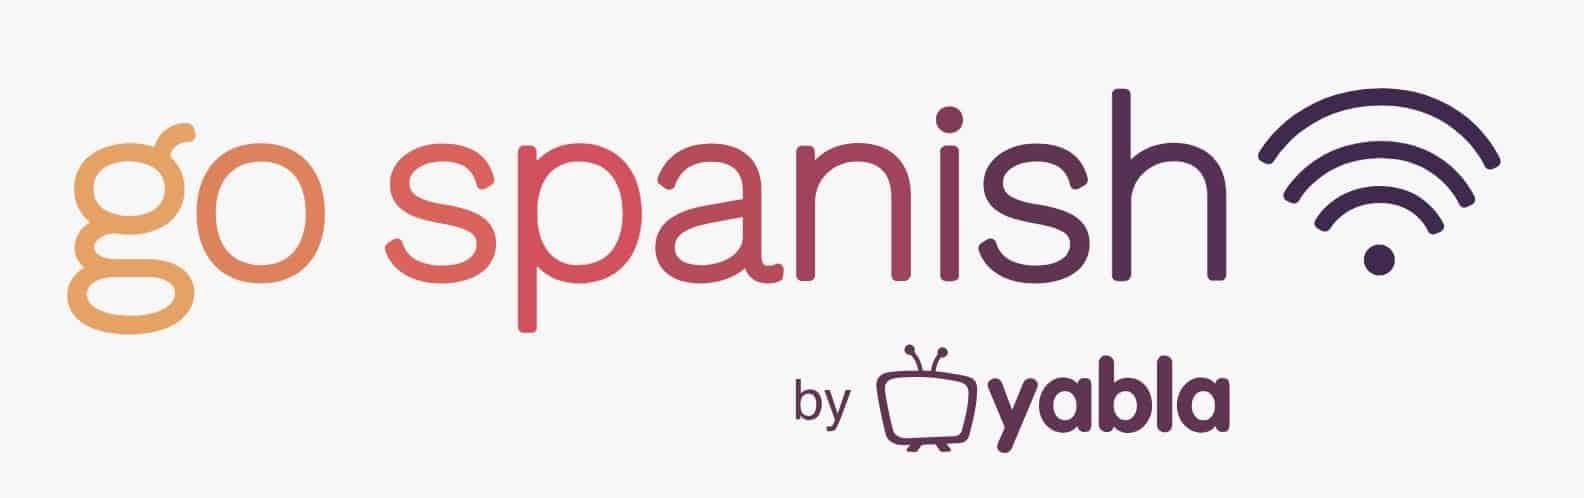 GoSpanish ロゴ